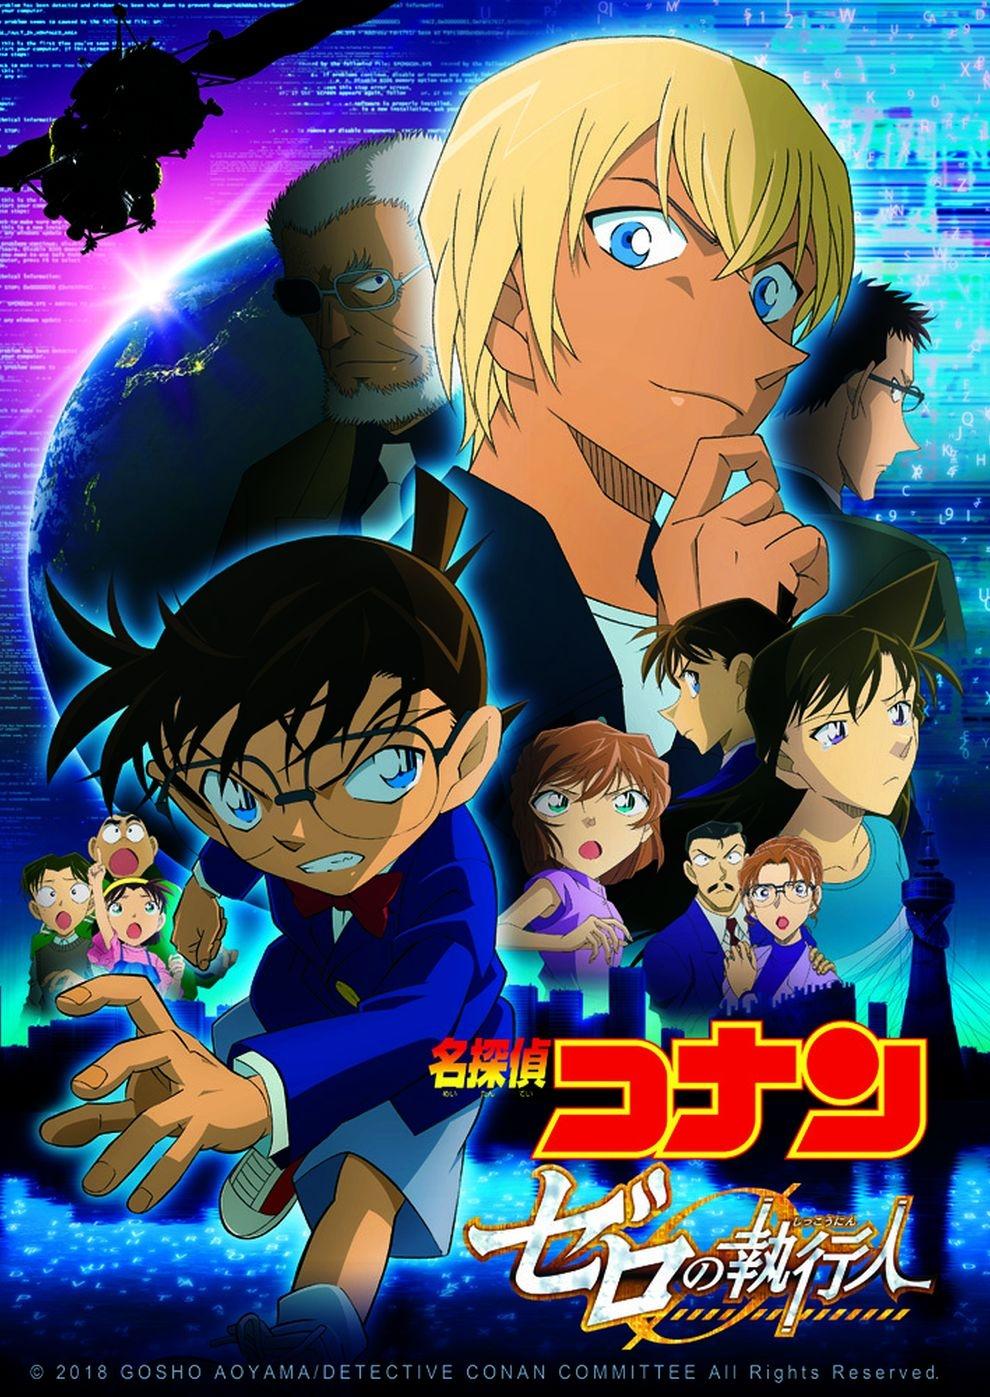 Anime Night 2019: Detective Conan Film 22 - Zero The Enforcer (Poster)